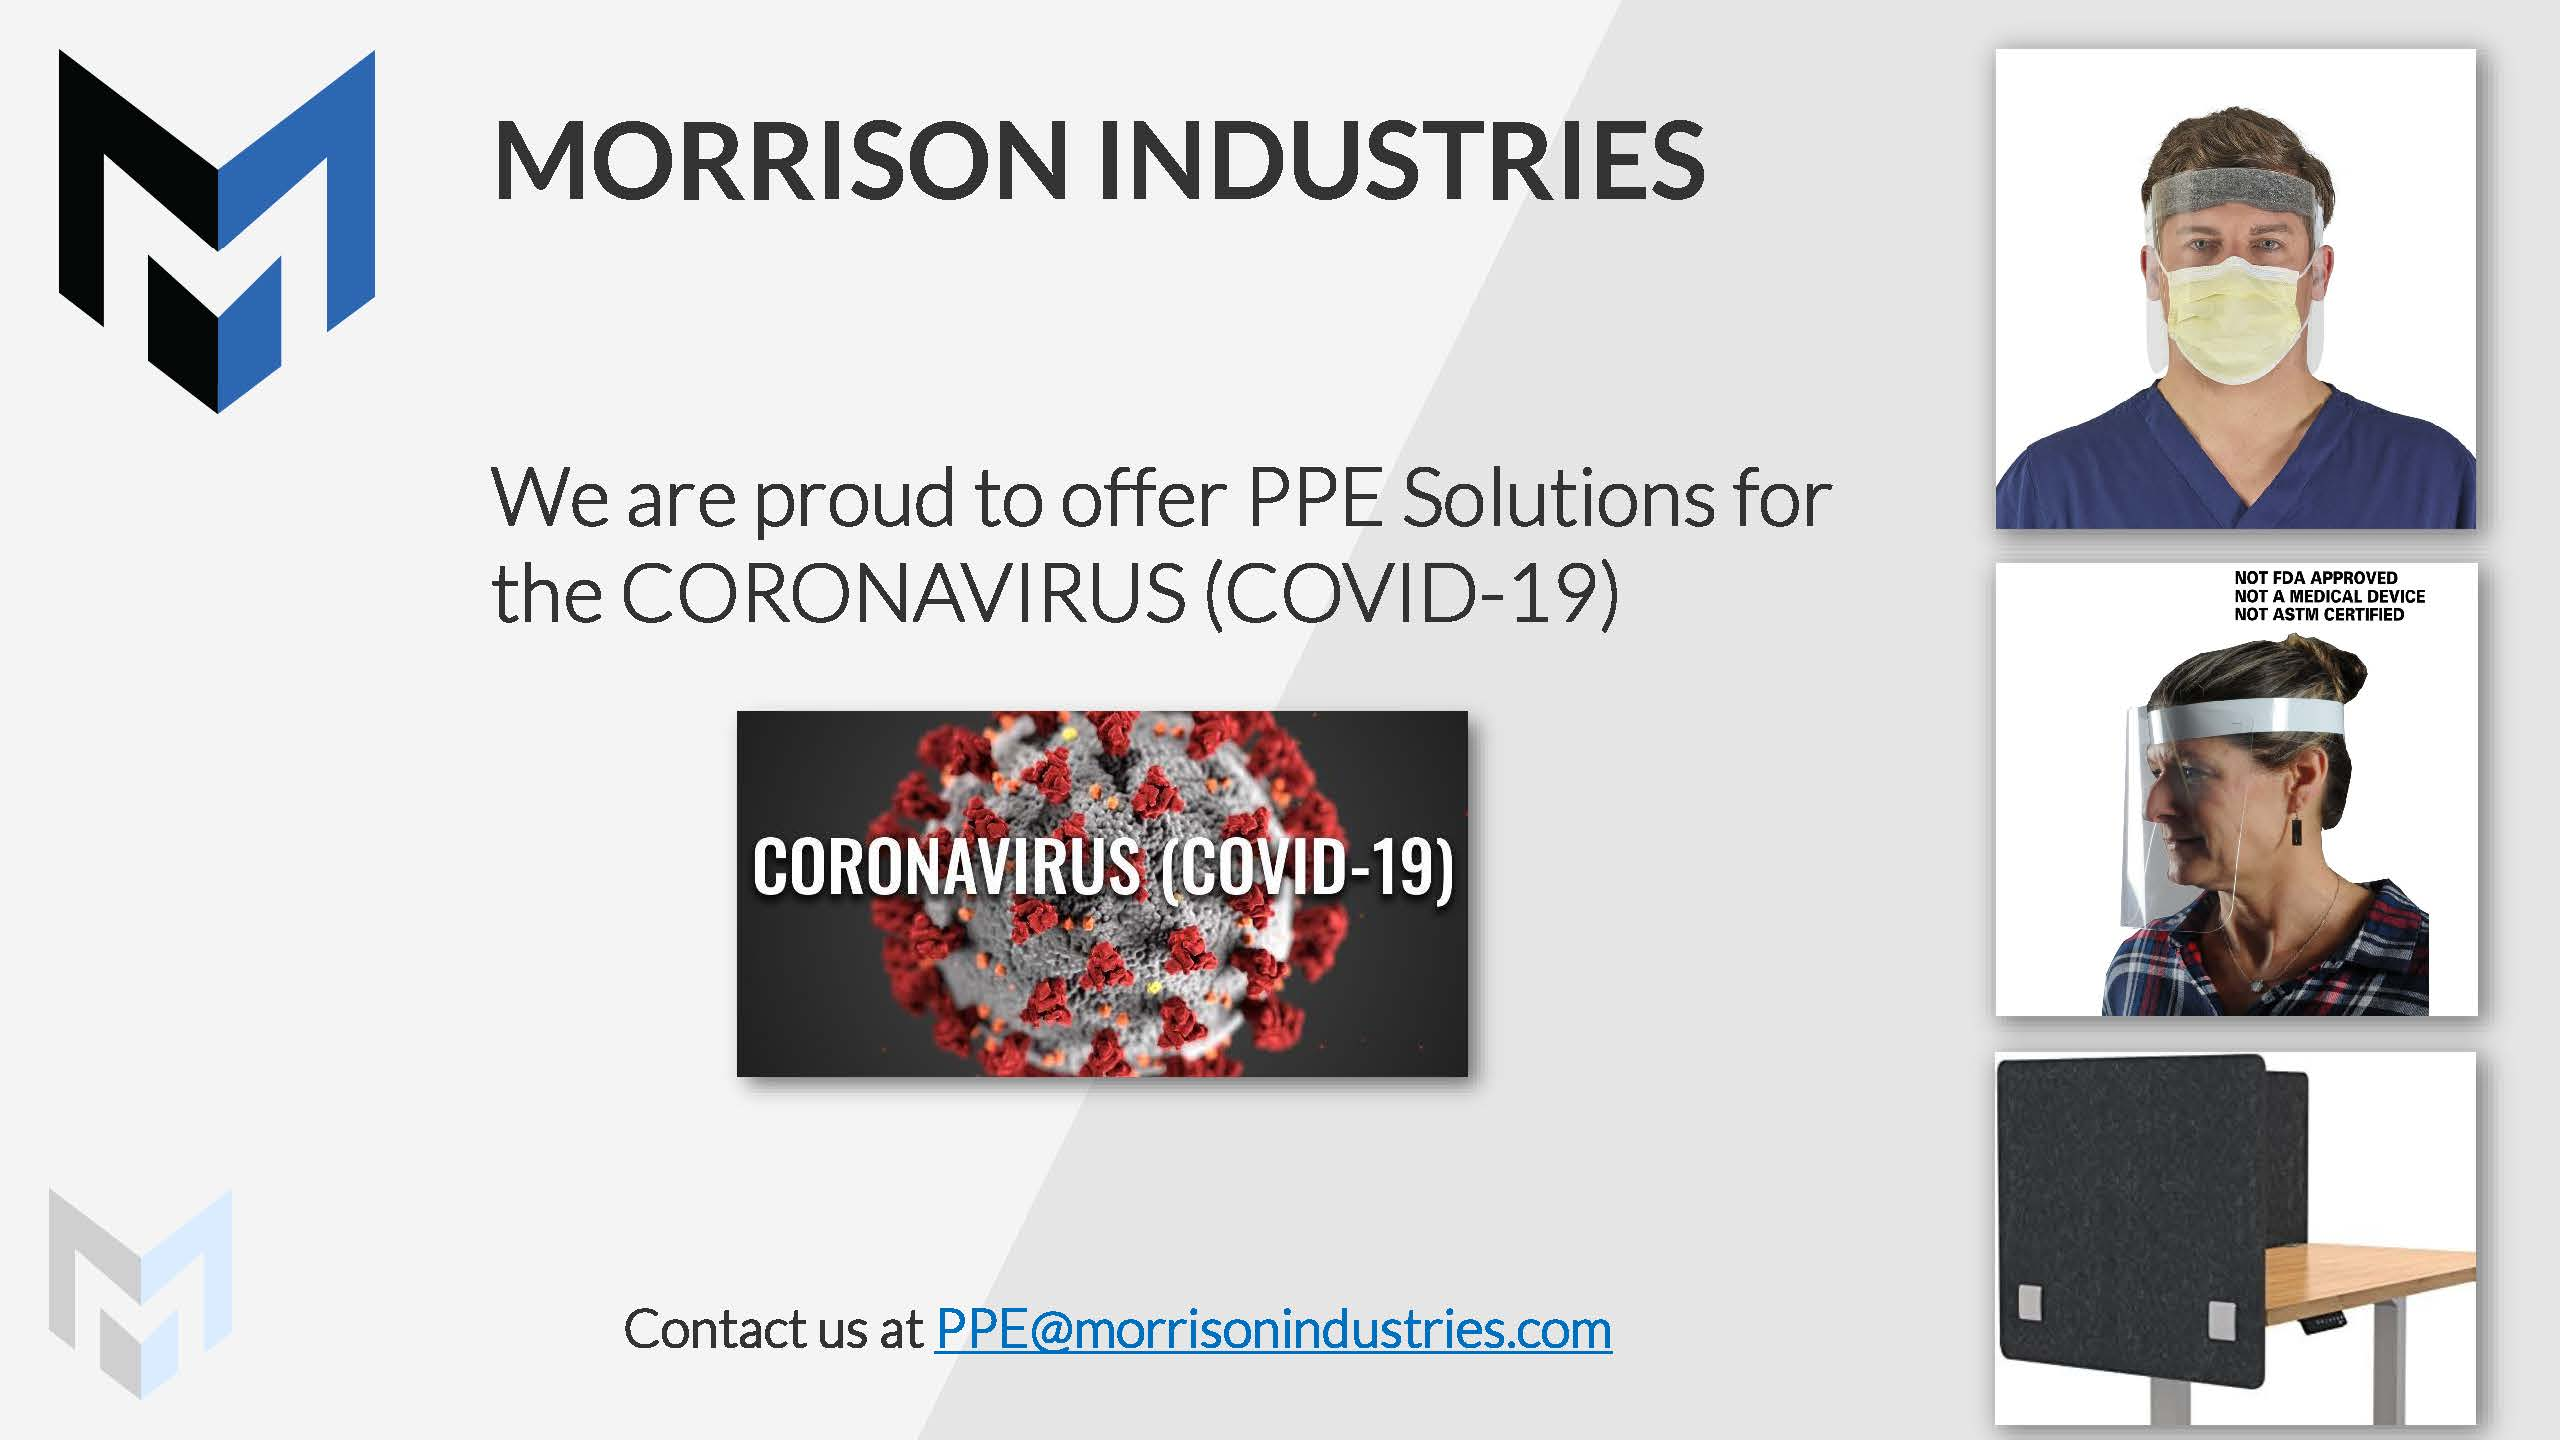 PPE Morrison Industries